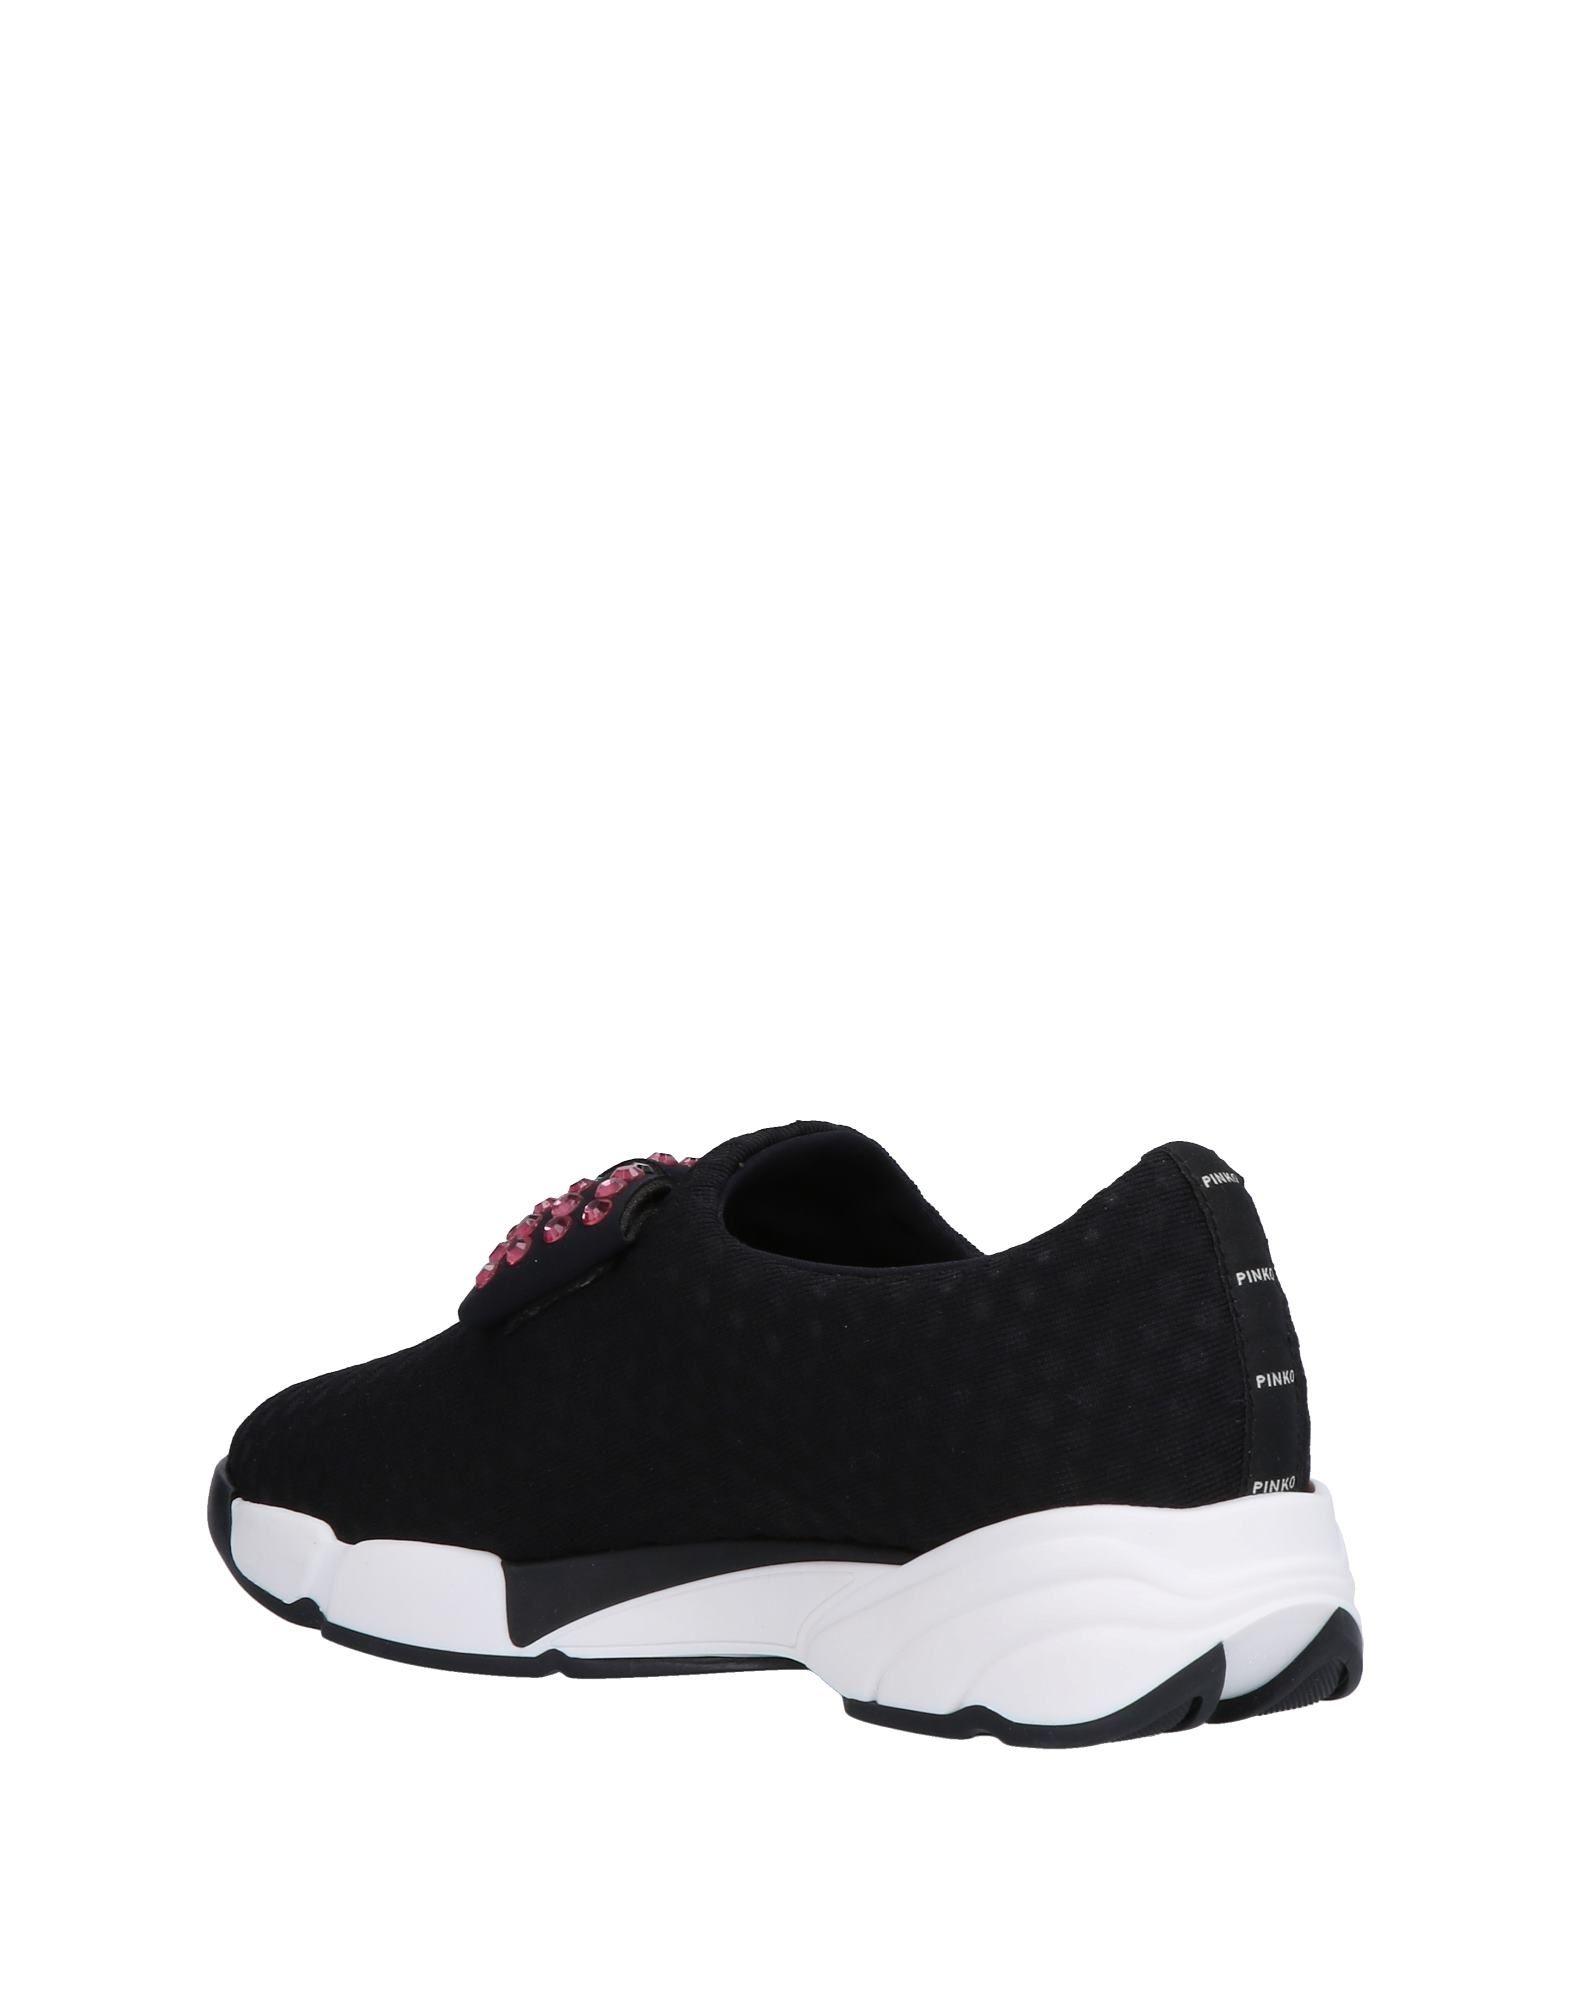 Pinko Sneakers - Women Pinko Pinko Pinko Sneakers online on  United Kingdom - 11503502NN 610207